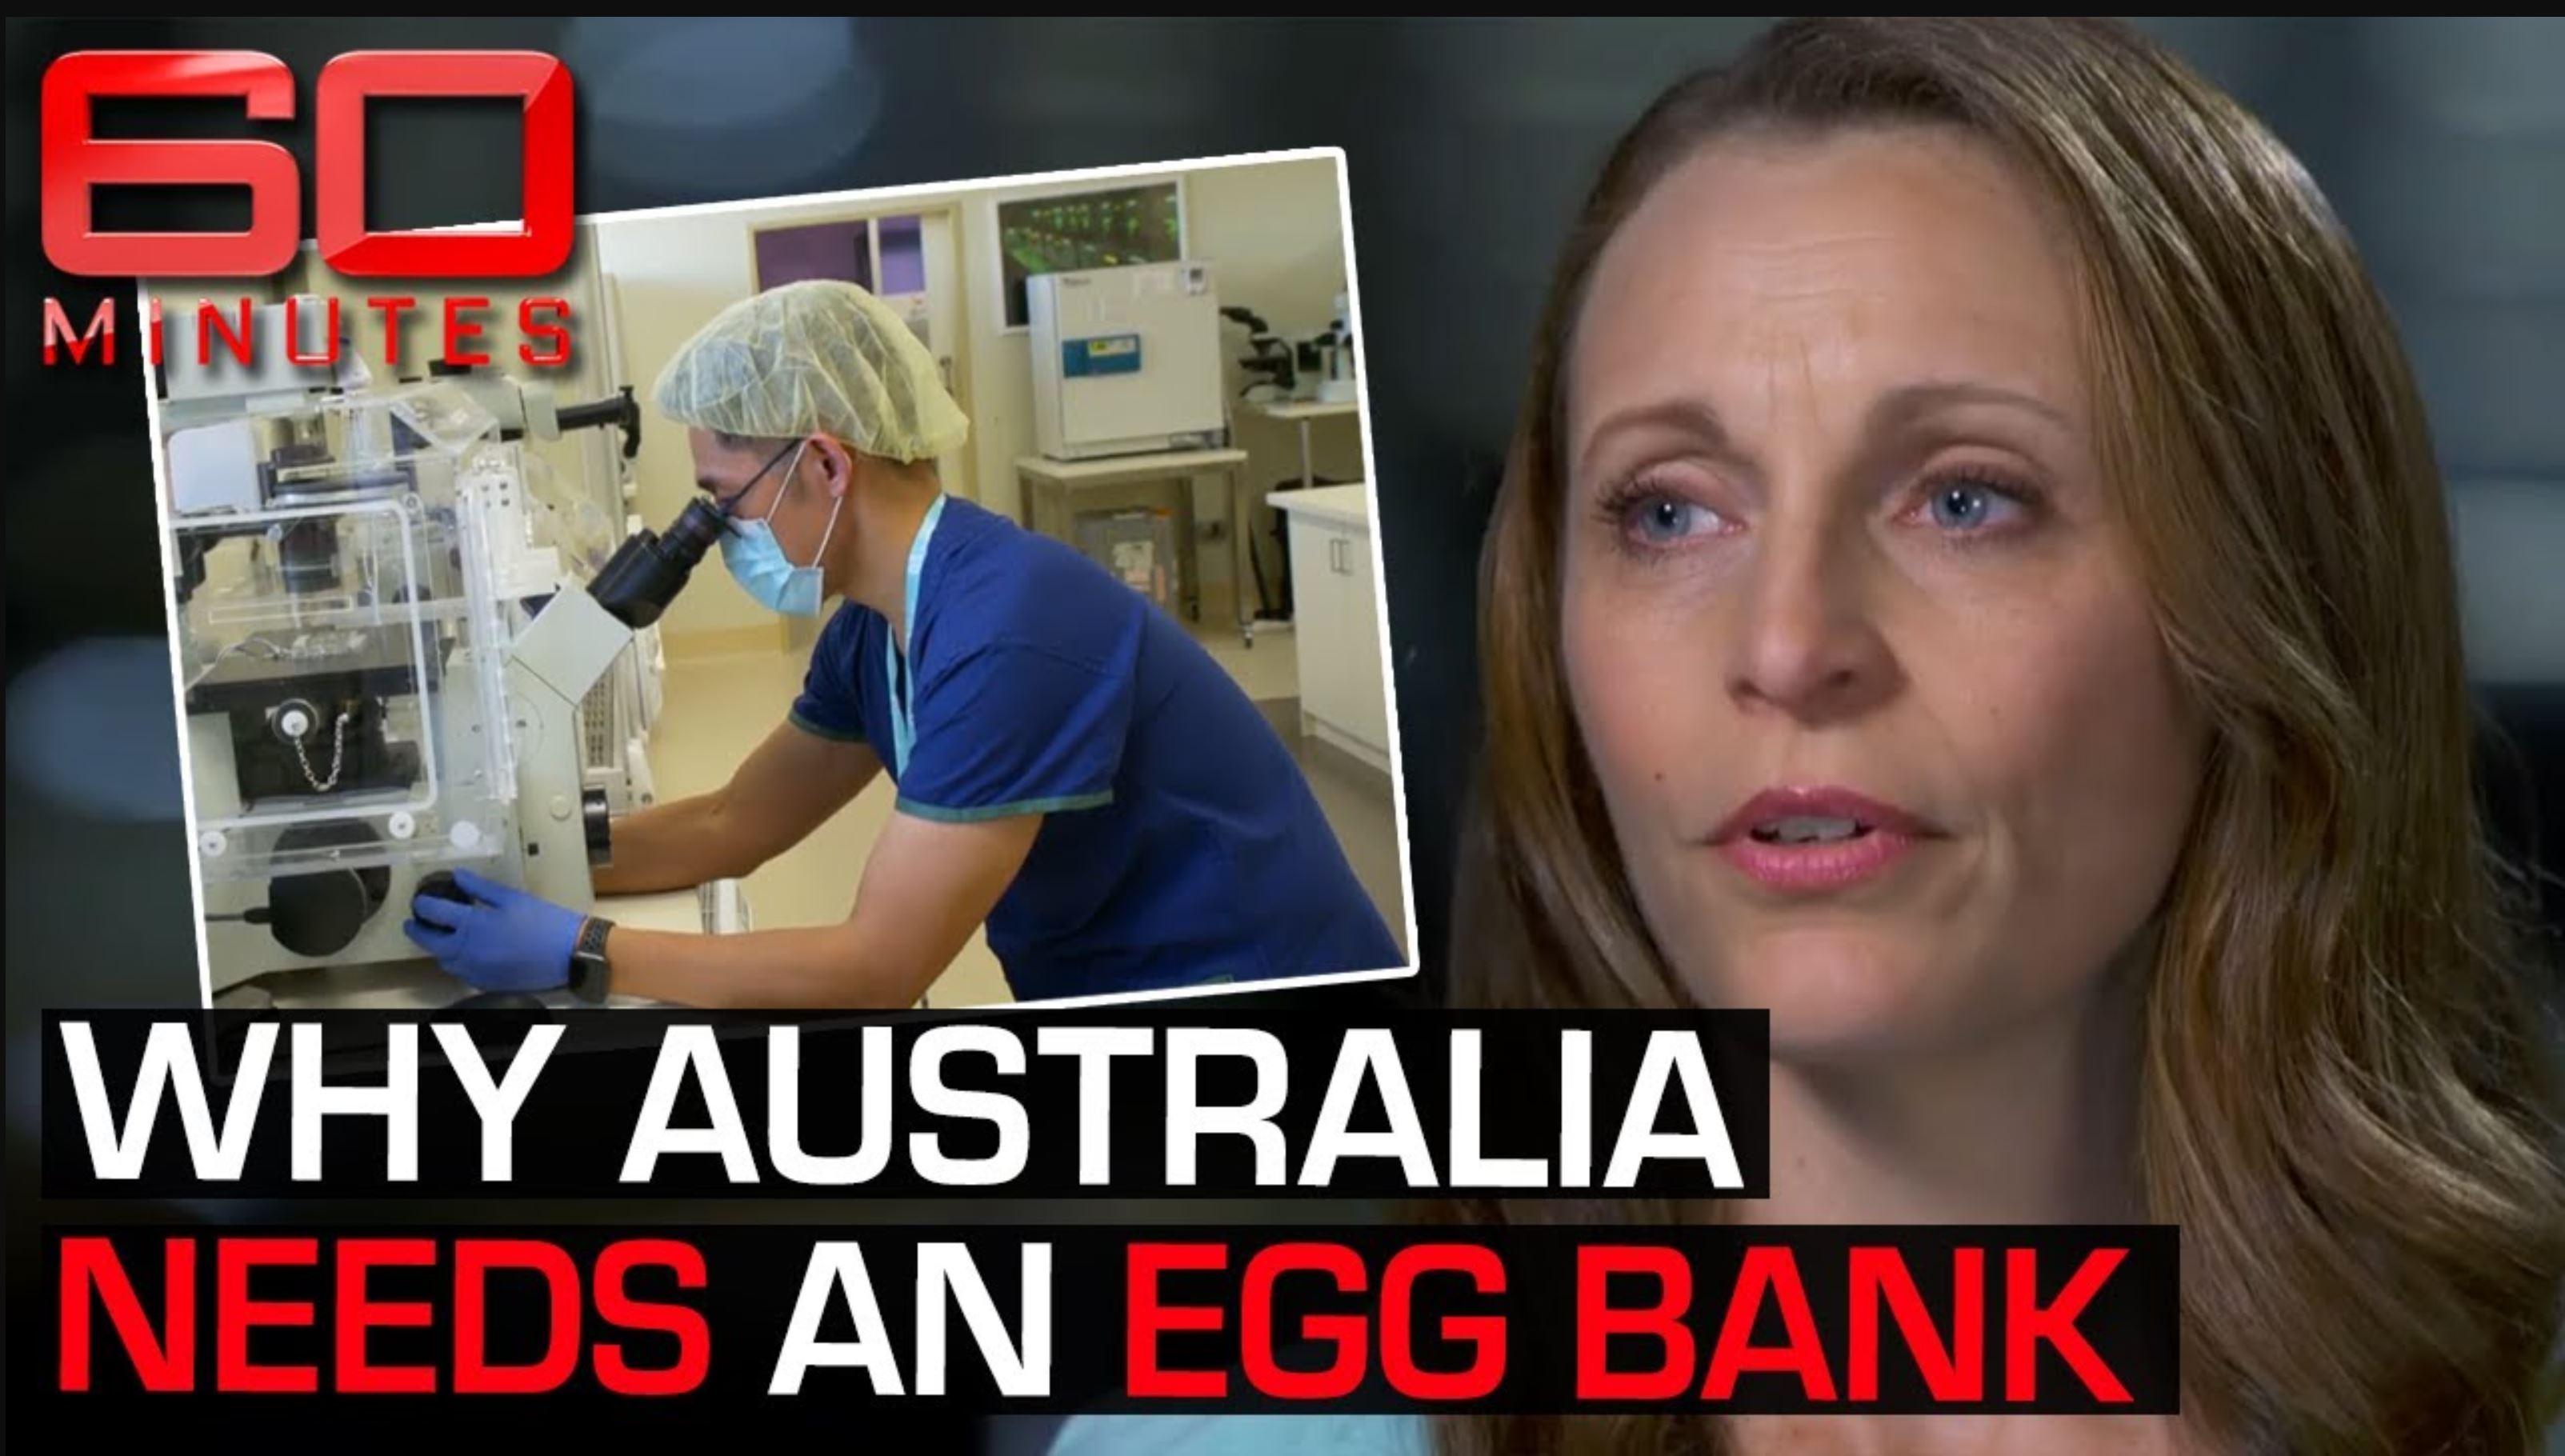 """It's not okay!"" Why Australia desperately needs an egg bank"